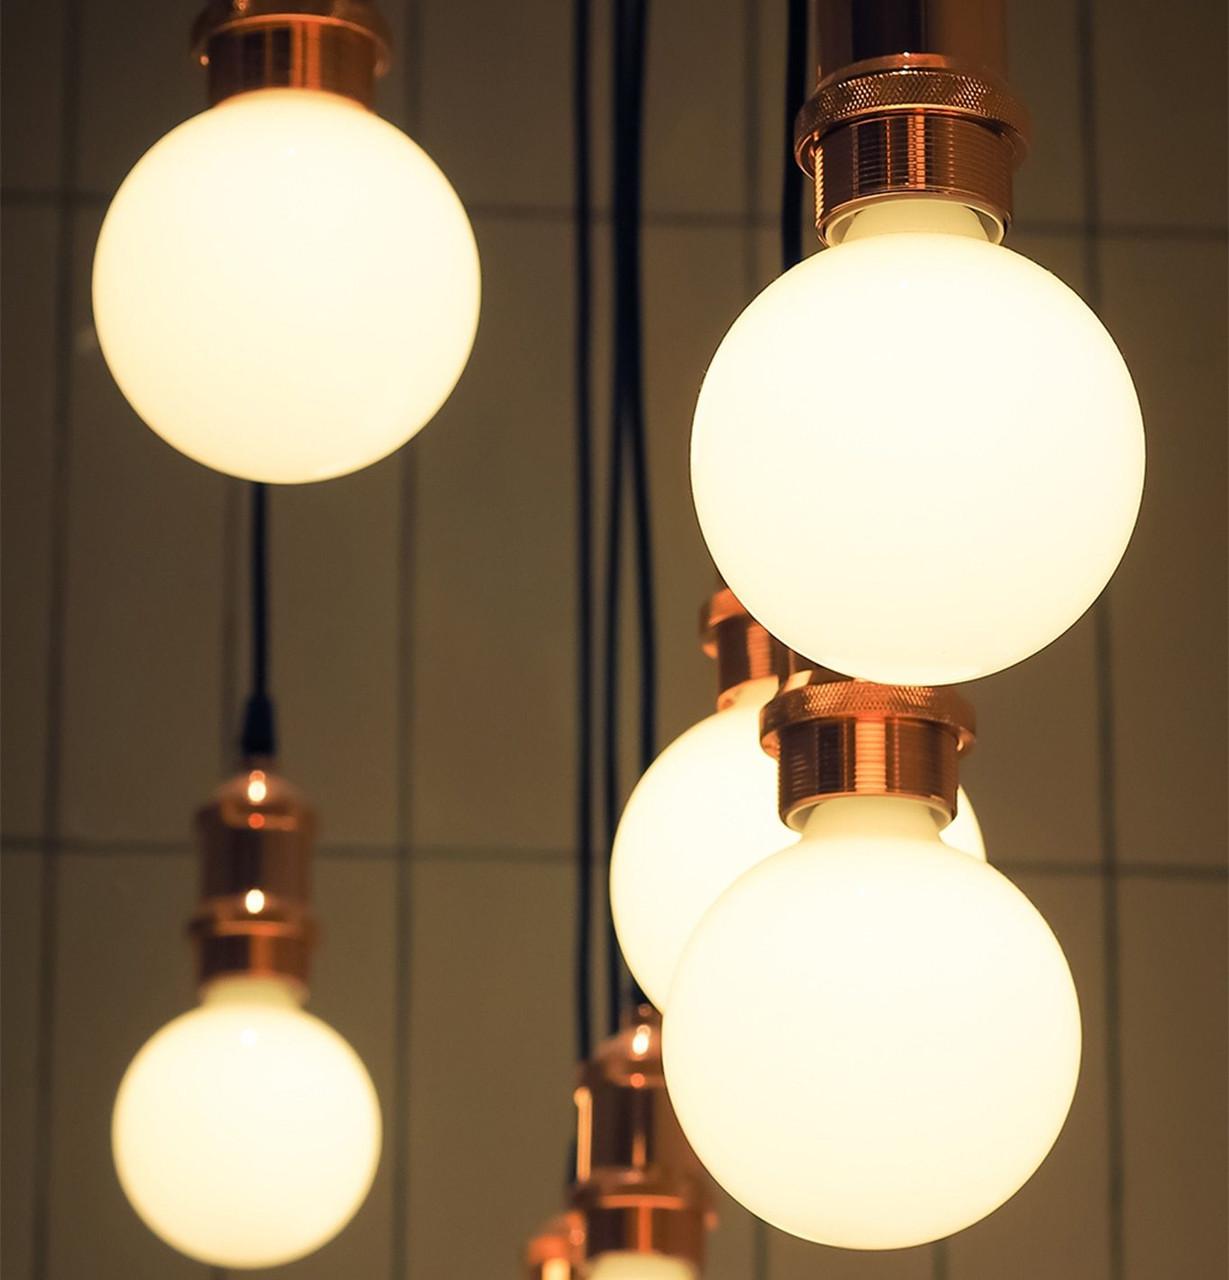 Crompton Lamps LED G95 5 Watt Light Bulbs